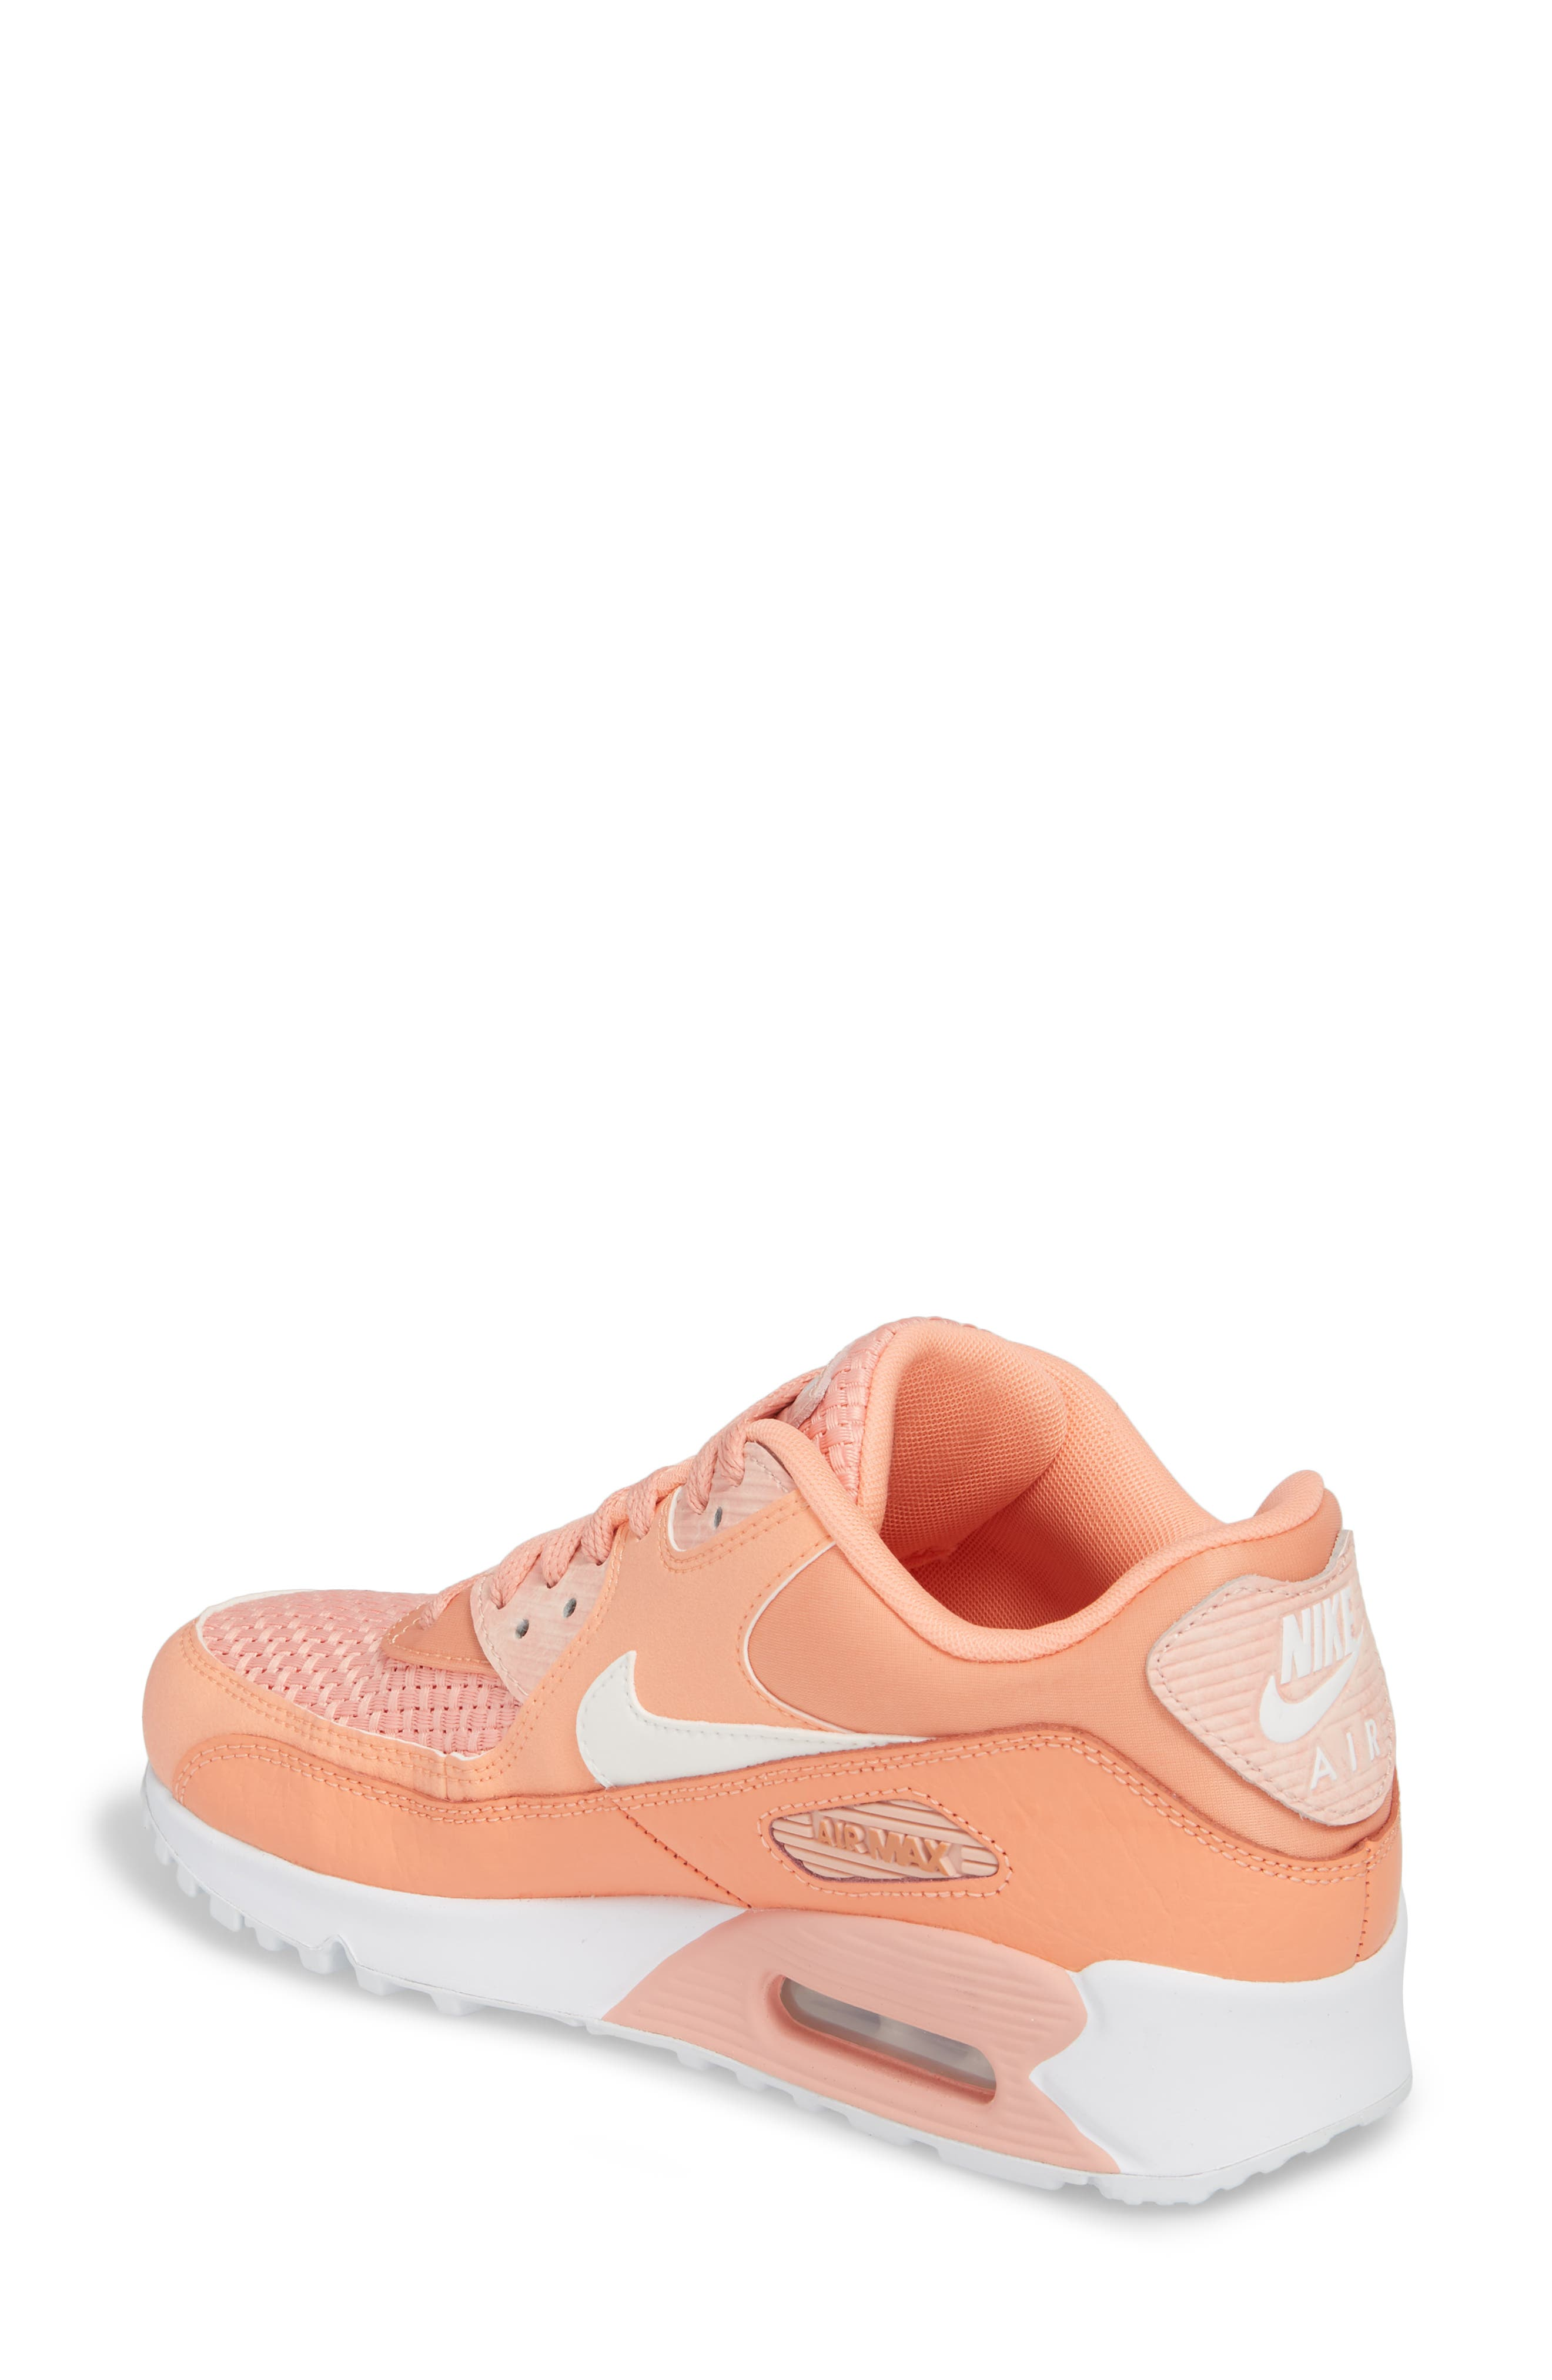 Air Max 90 SE Sneaker,                             Alternate thumbnail 12, color,